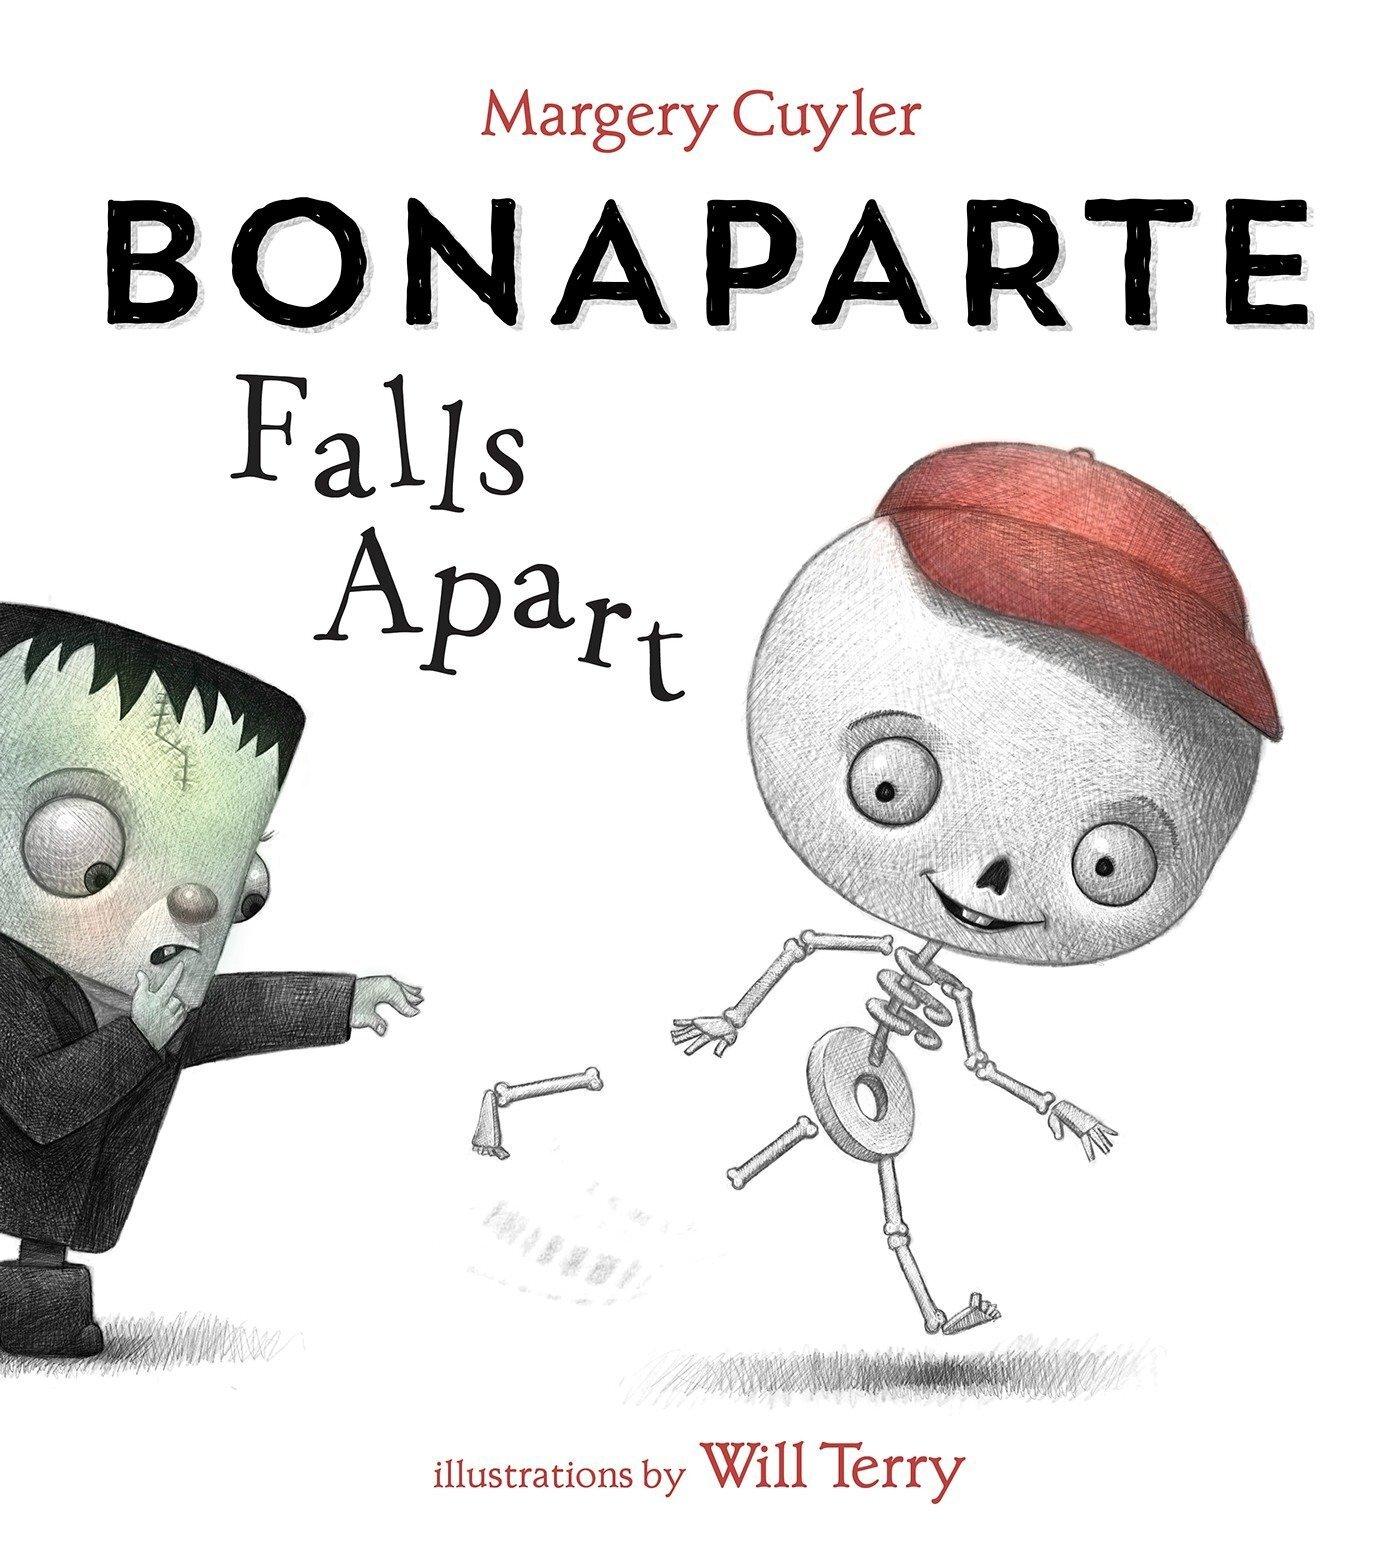 Bonapart falls apart companion book to Dem Bones